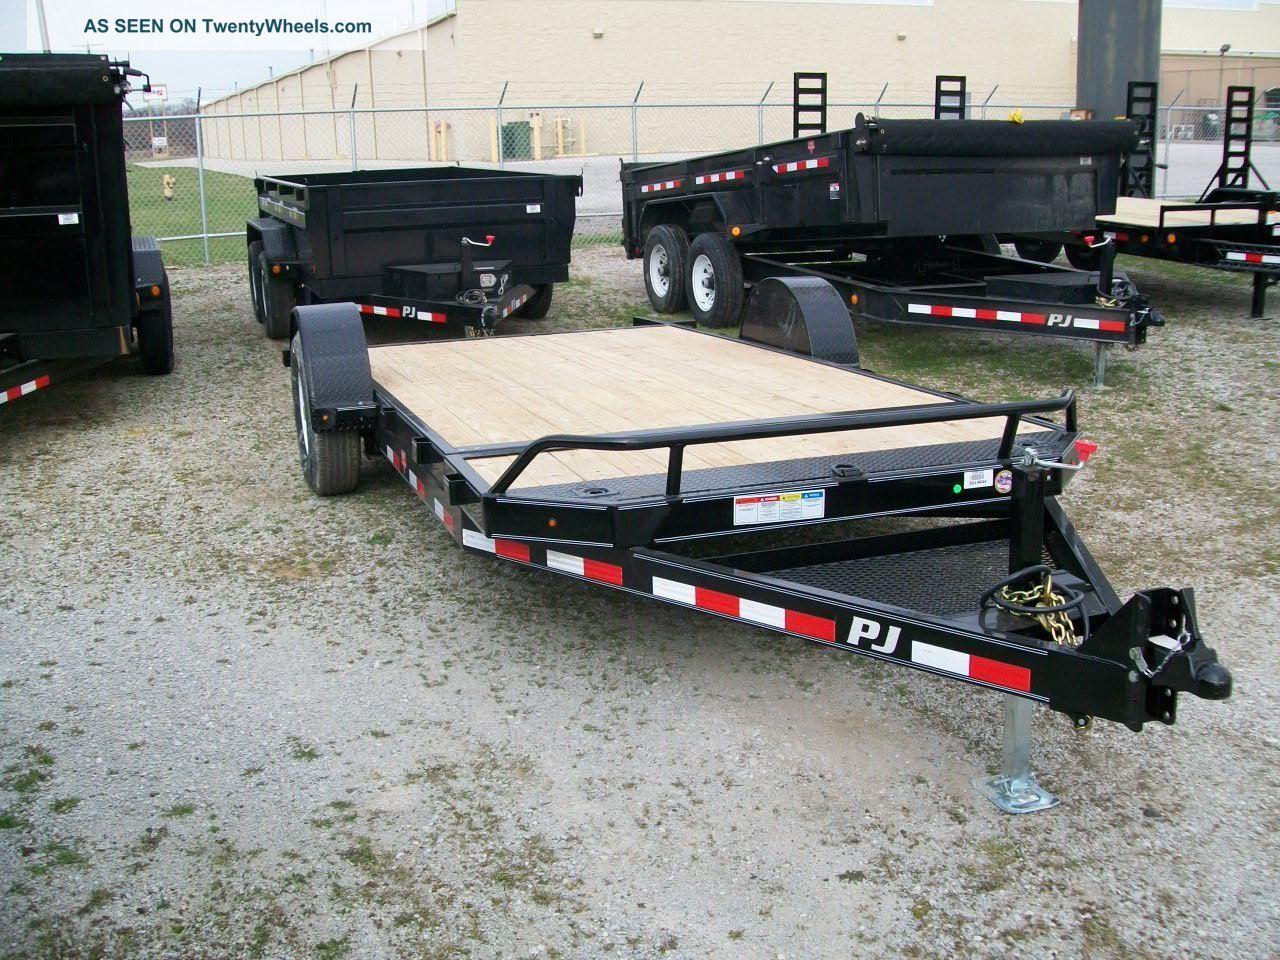 Tractor Supply Axle Trailer : Pj tilt equipment trailer gvw single